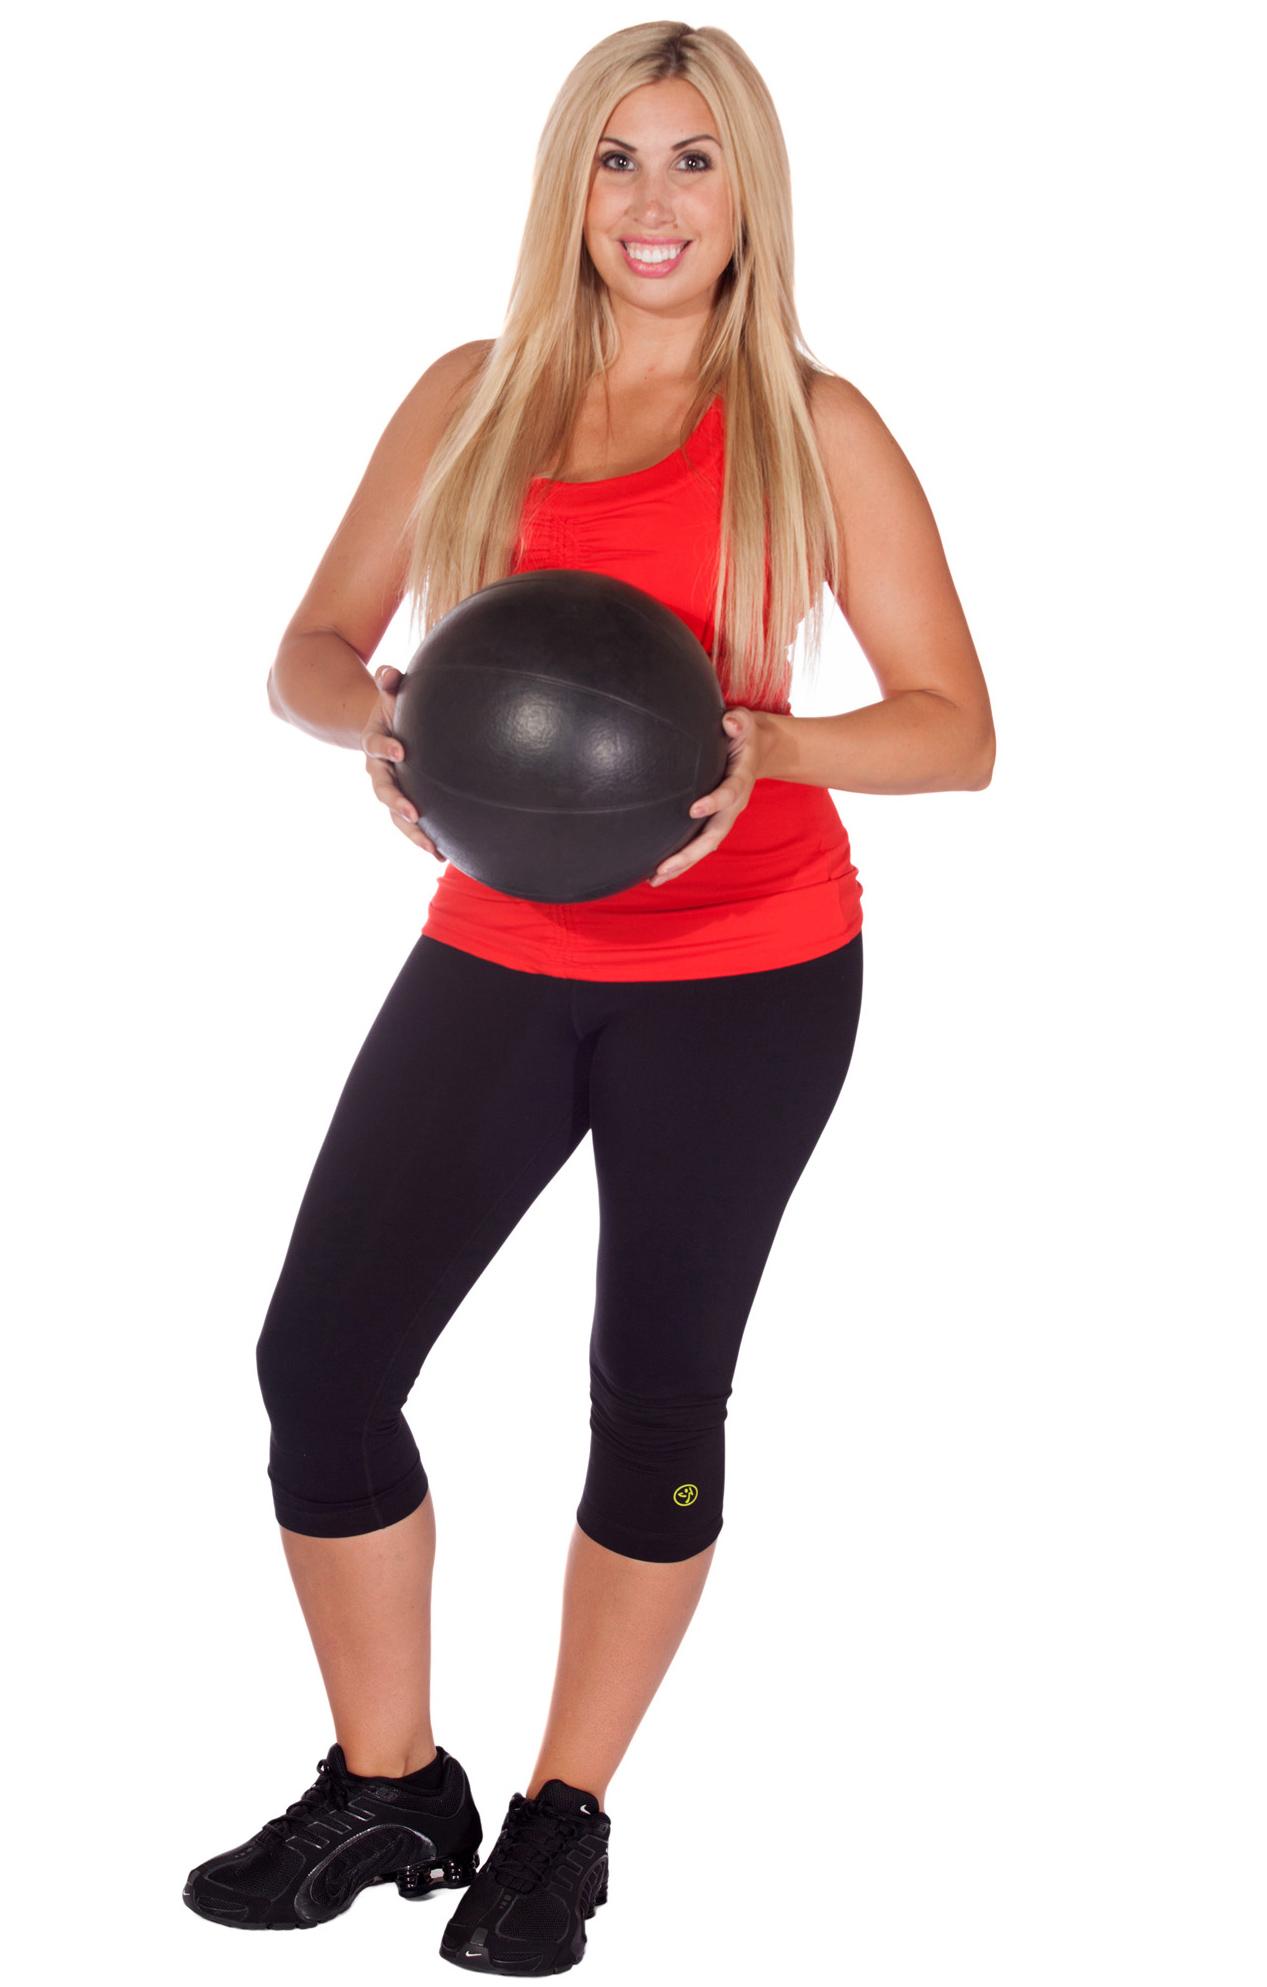 phoebe-flannagan-with-ball-40-below-fitness-center-fairbanks-ak-151-web-4.jpg